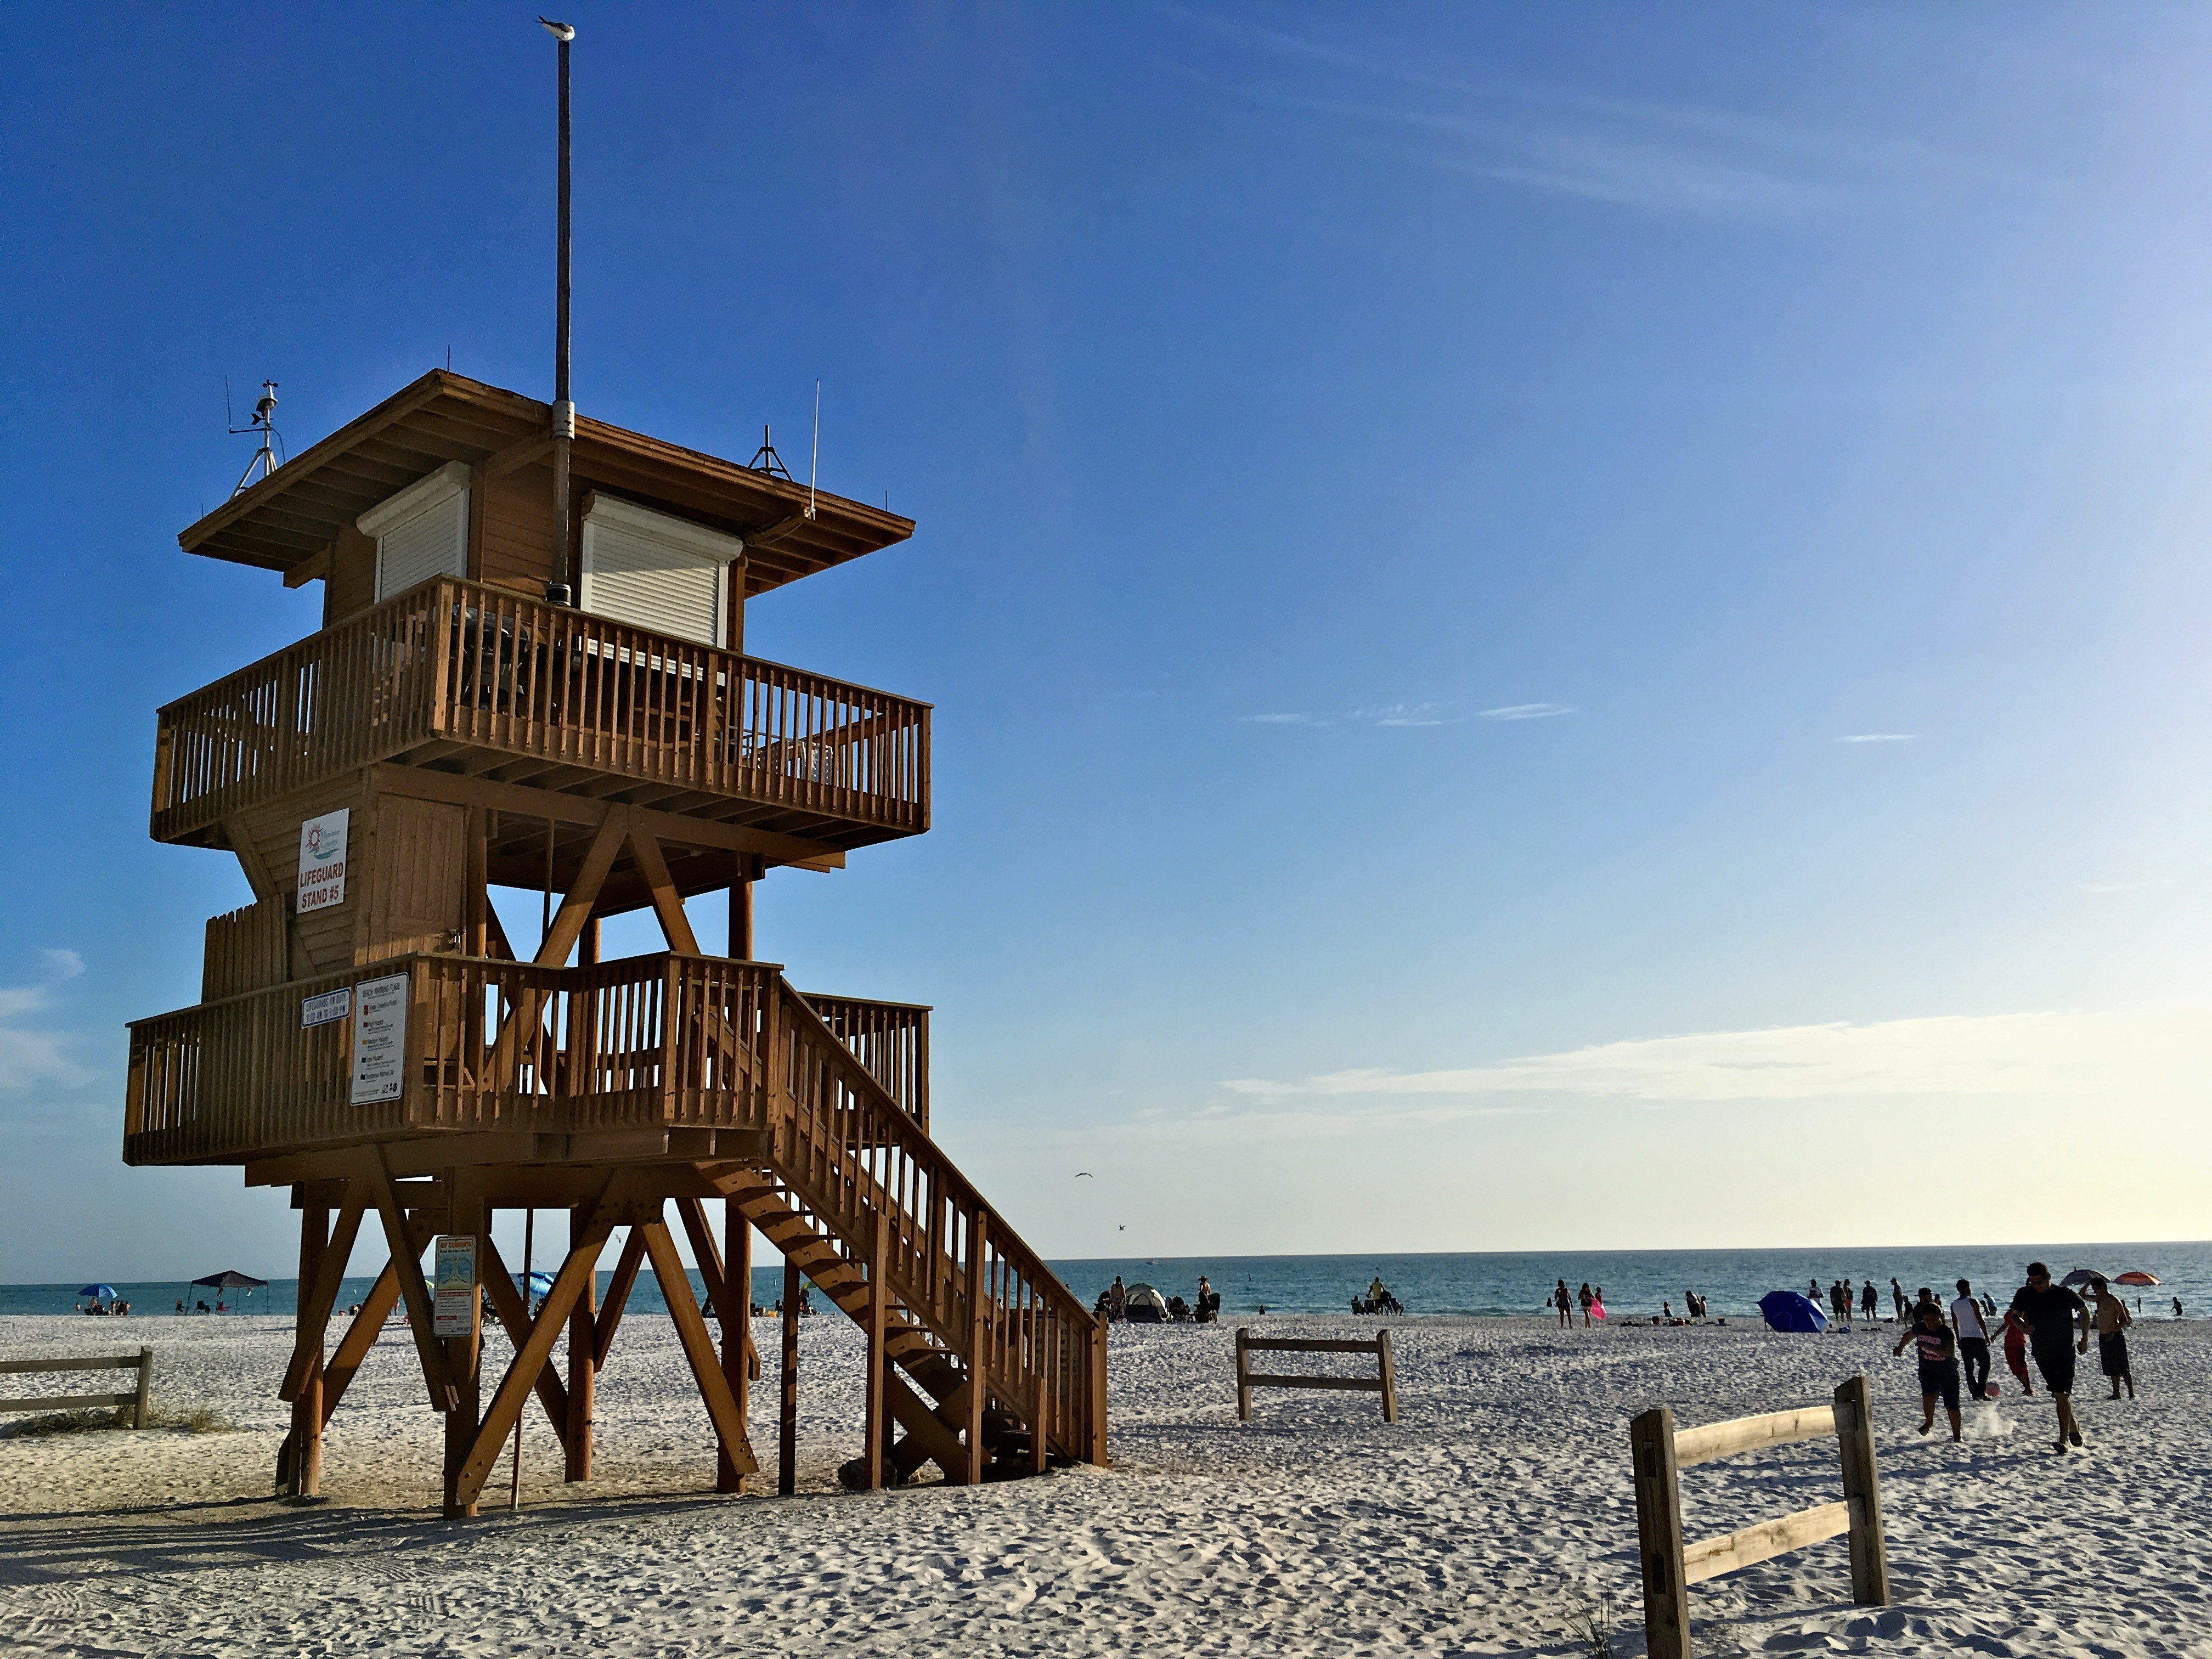 Sarasota beaches - Beaches In Sarasota